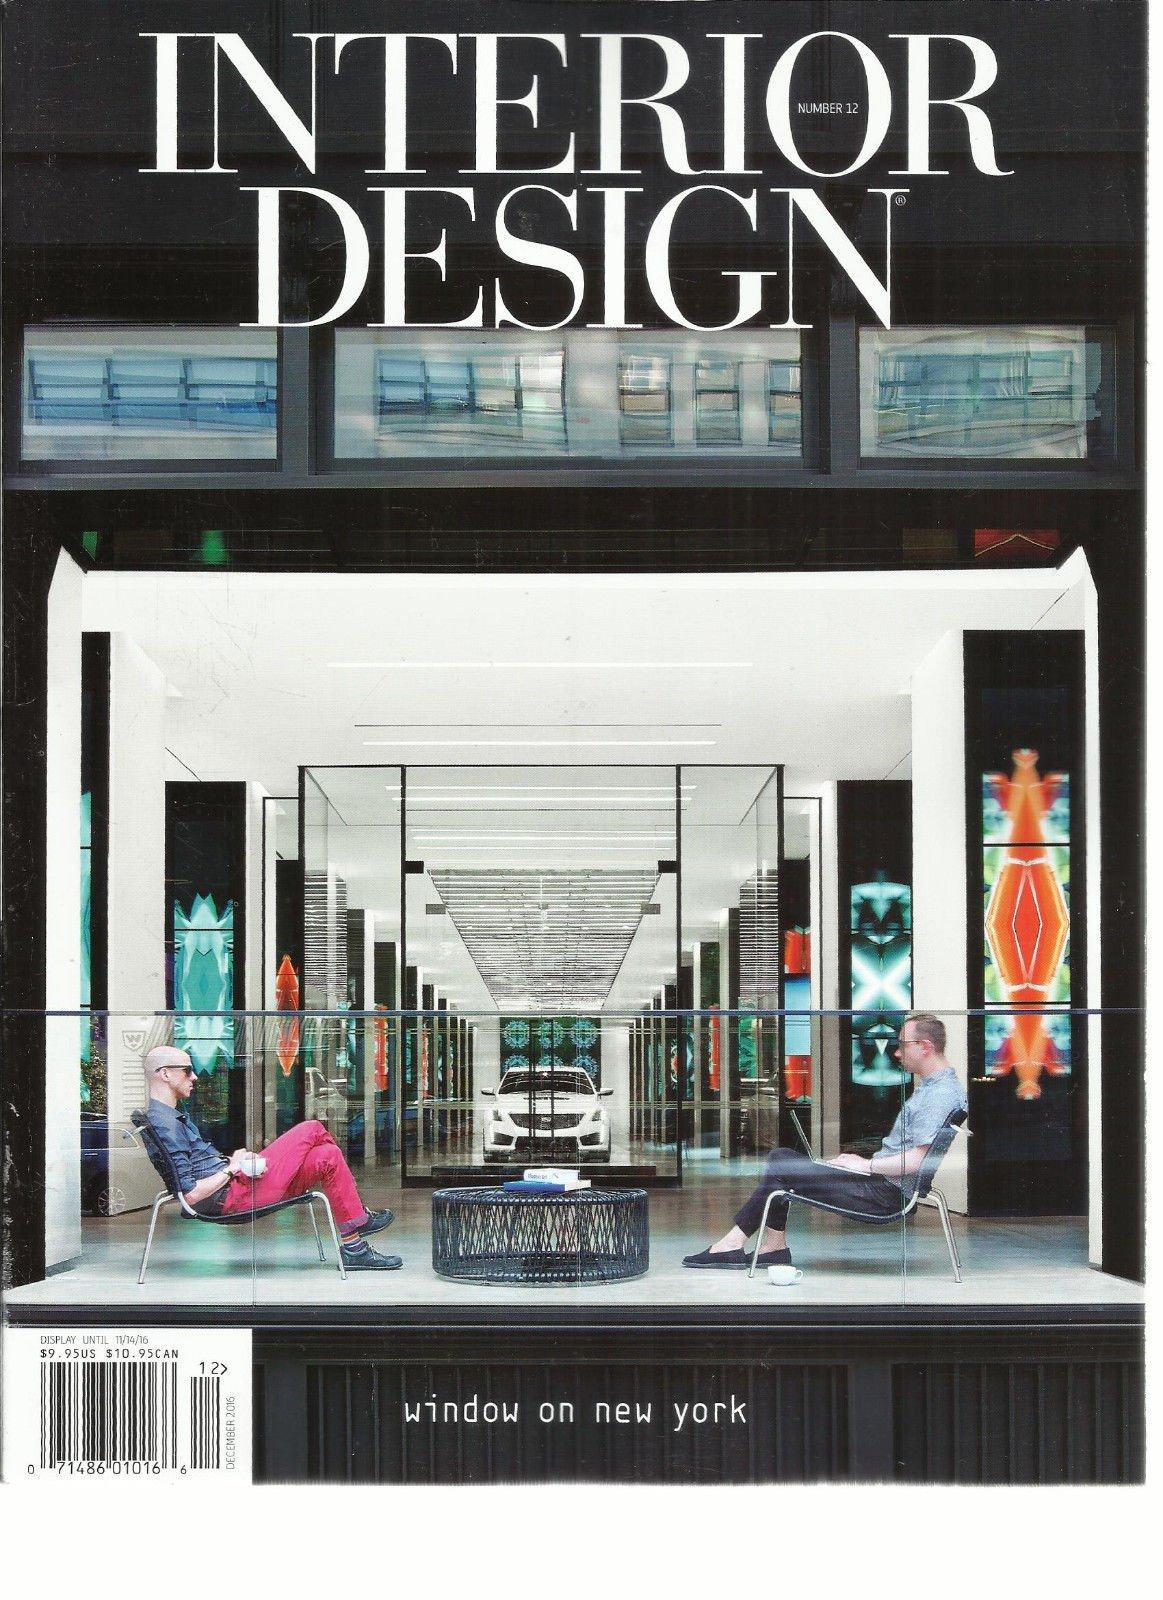 INTERIOR DESIGN MAGAZINE, ISSUE, 2016 NUMBER,12 WINDOW ON NEW YORK